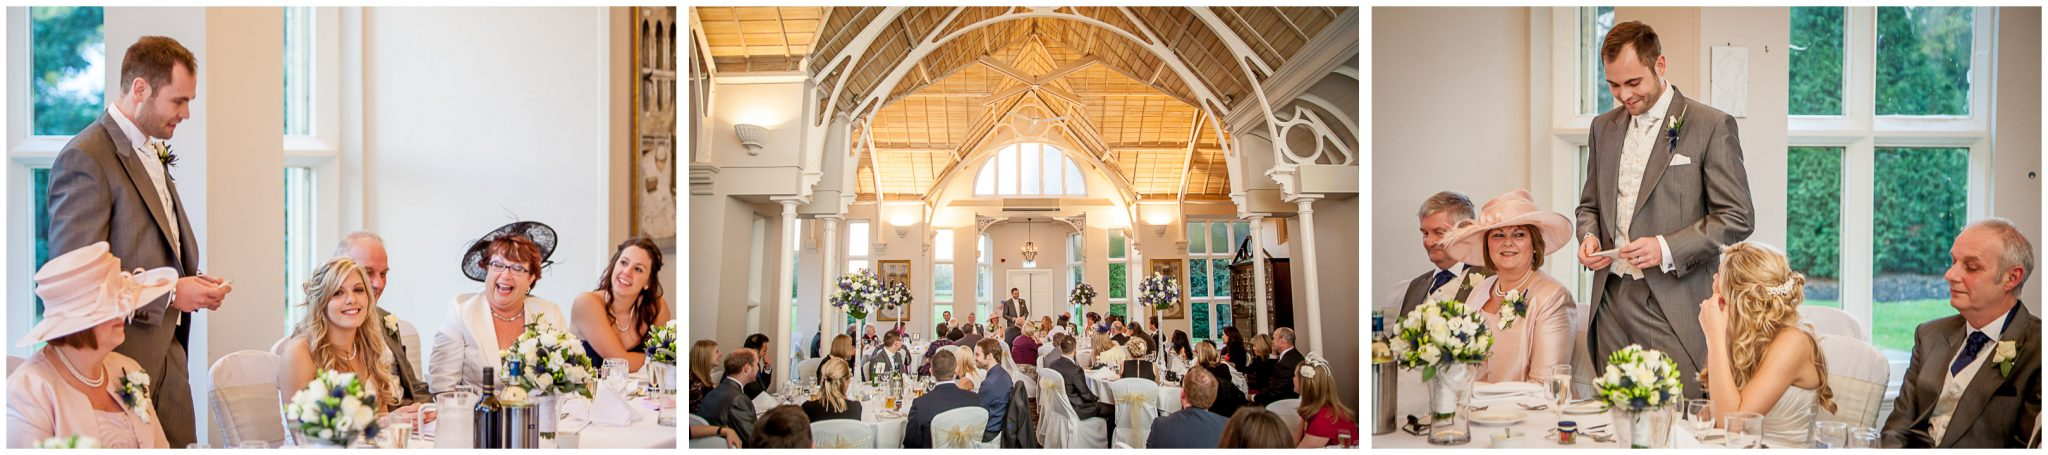 Audleys Wood wedding photography groom's speech